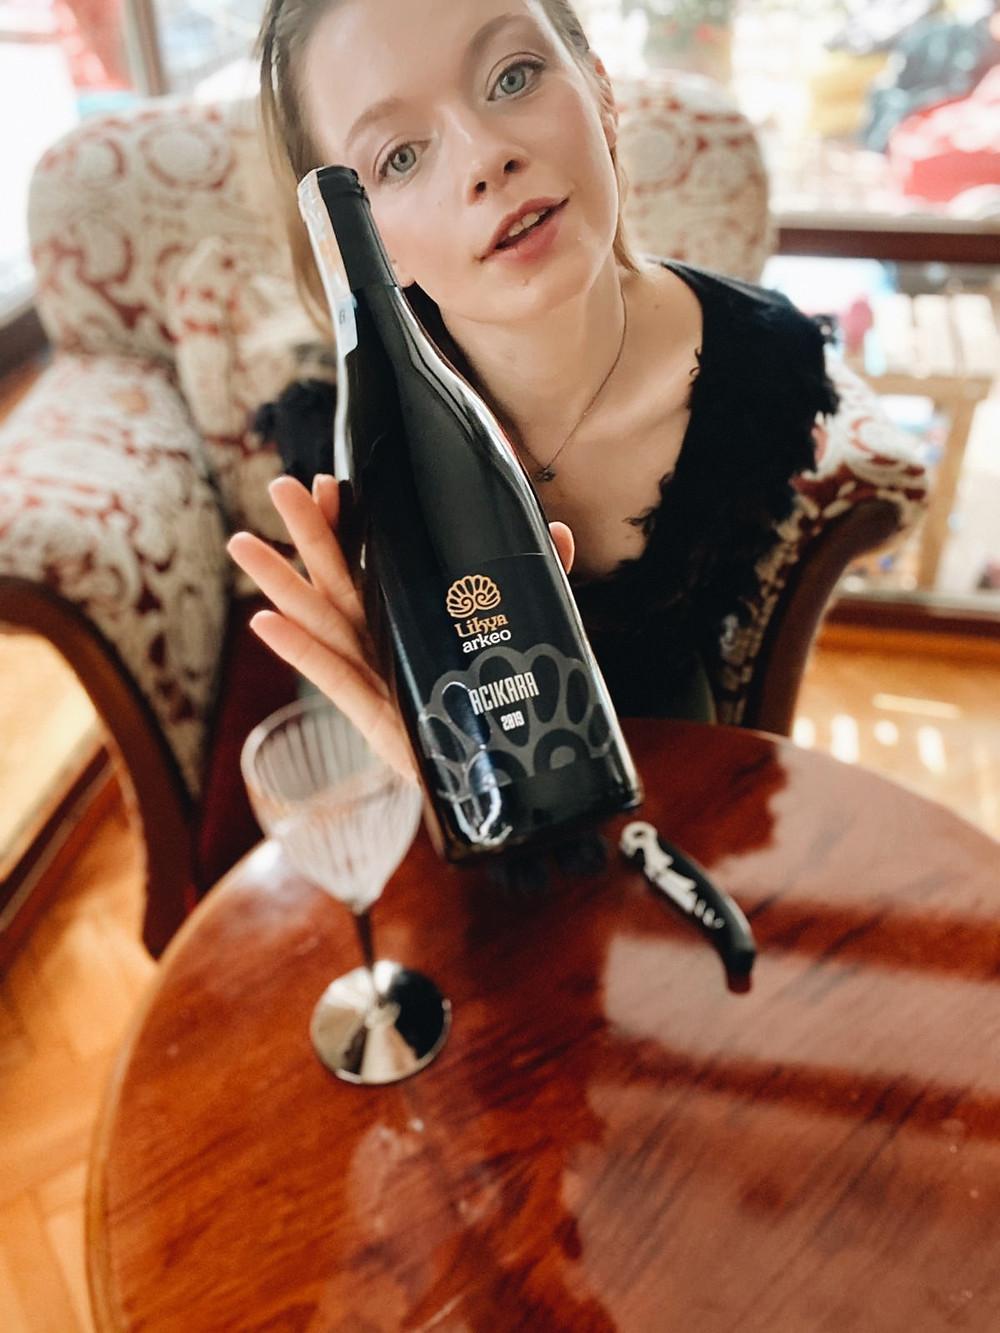 Wine tasting Likya Acikara a rare and indigenous Turkish grape variety from Antalya